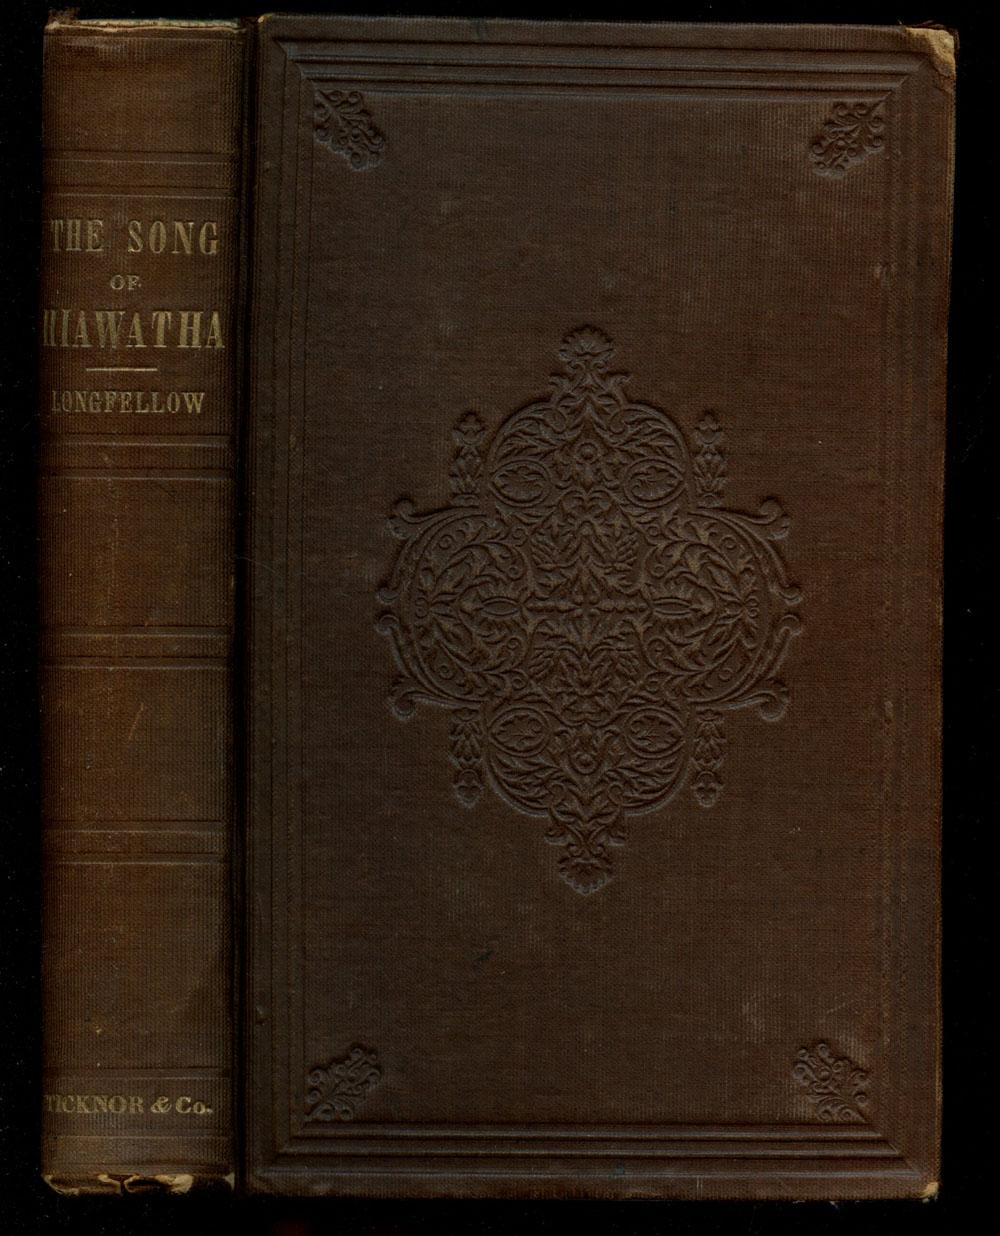 The Song of Hiawatha Longfellow, Henry Wadsworth